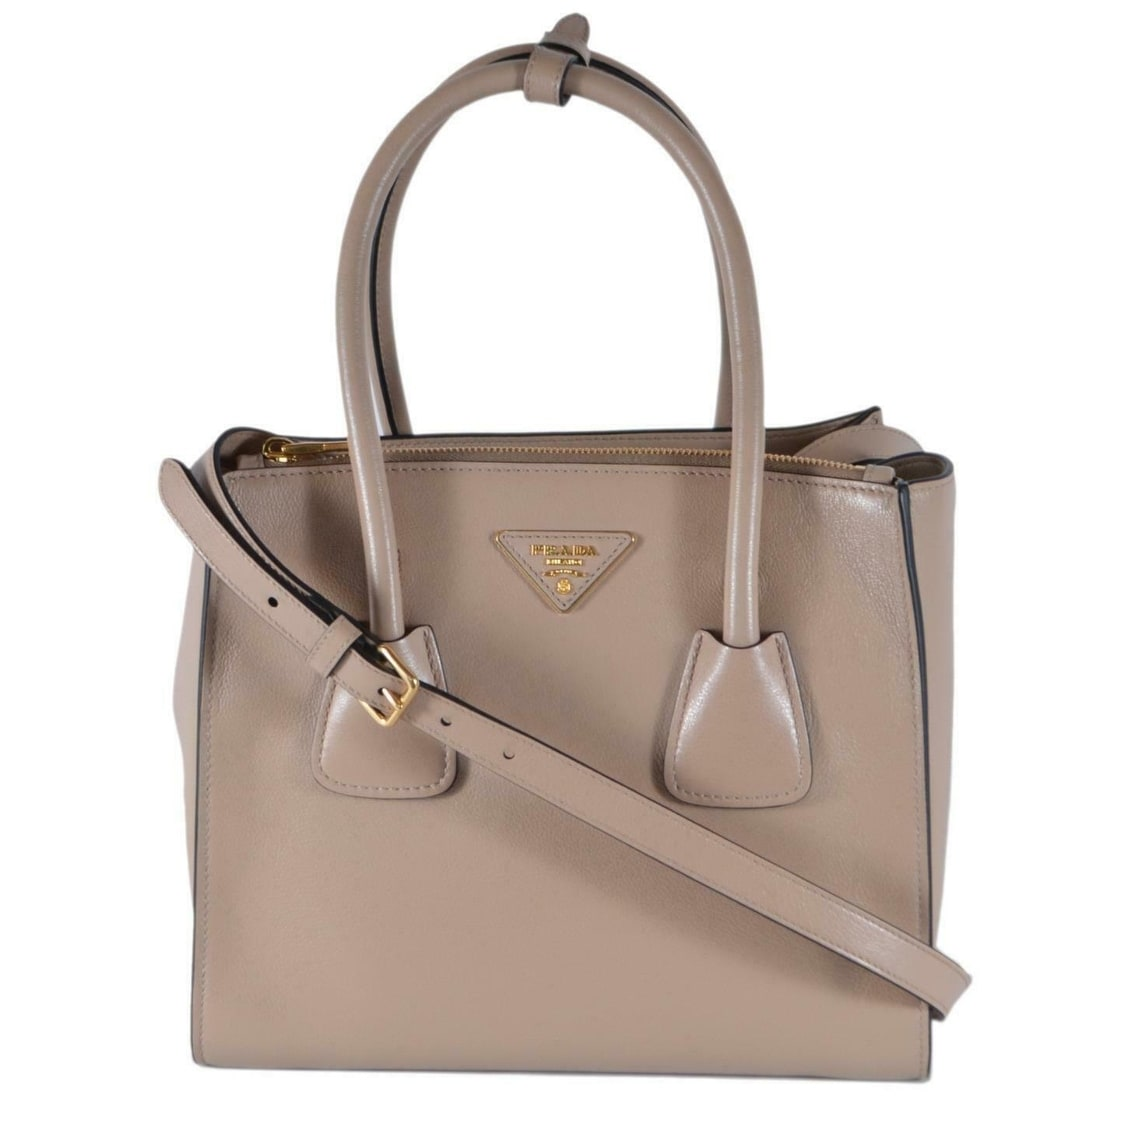 889f83e4011 Prada 1BG625 Cammeo Glace Leather Twins Convertible Shopper Purse Handbag -  Brown/Beige